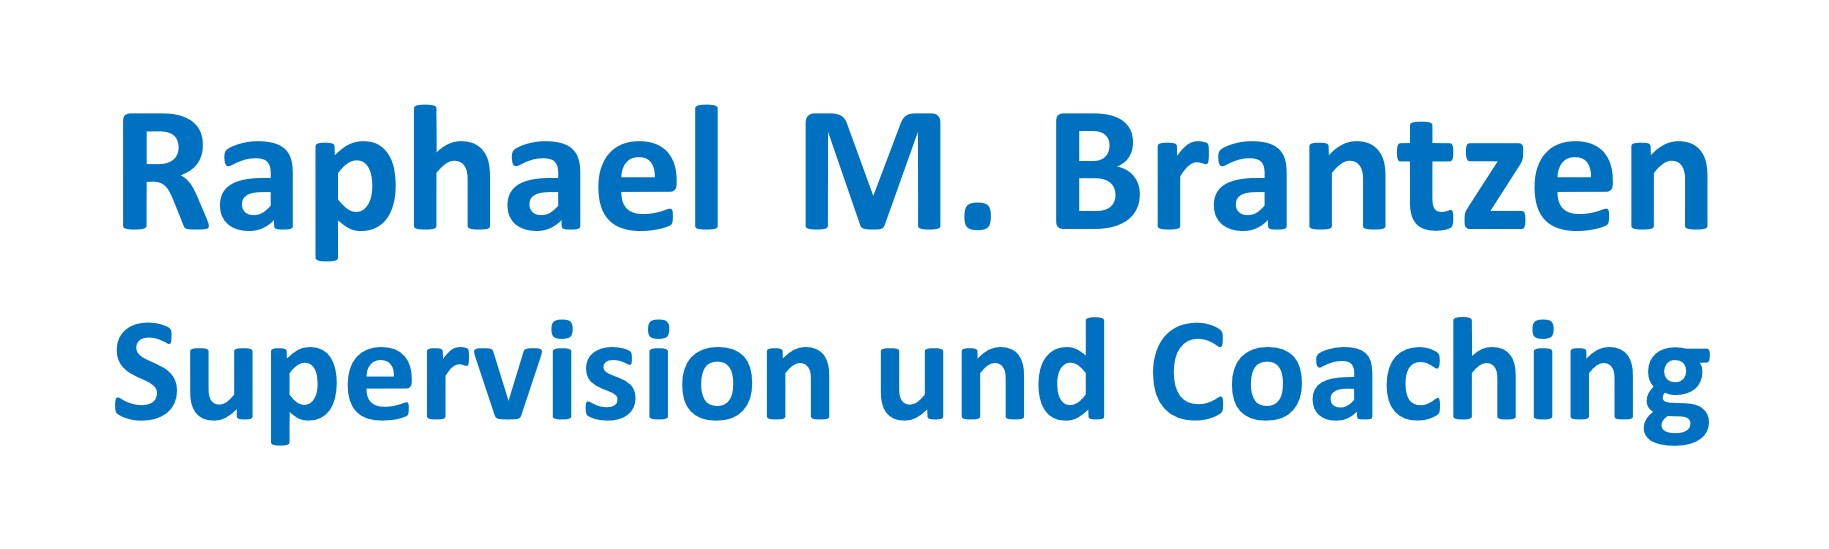 Raphael M. Brantzen